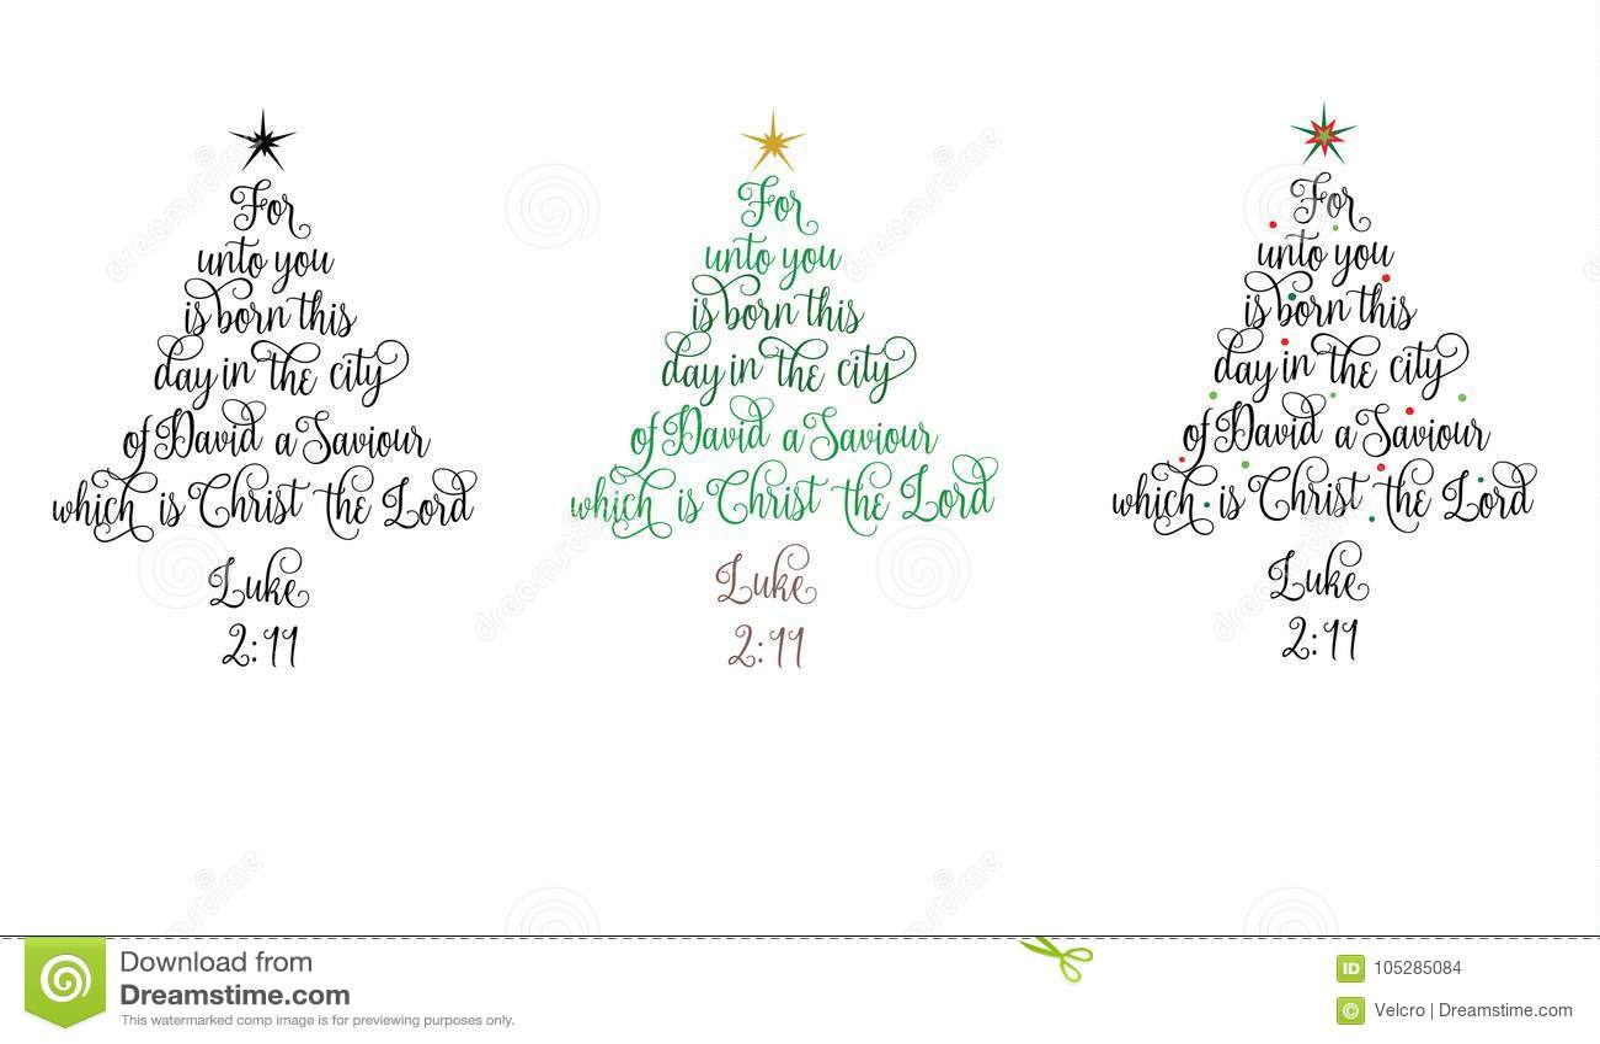 Luke 2:11 Christmas Tree Stock Vector. Illustration Of